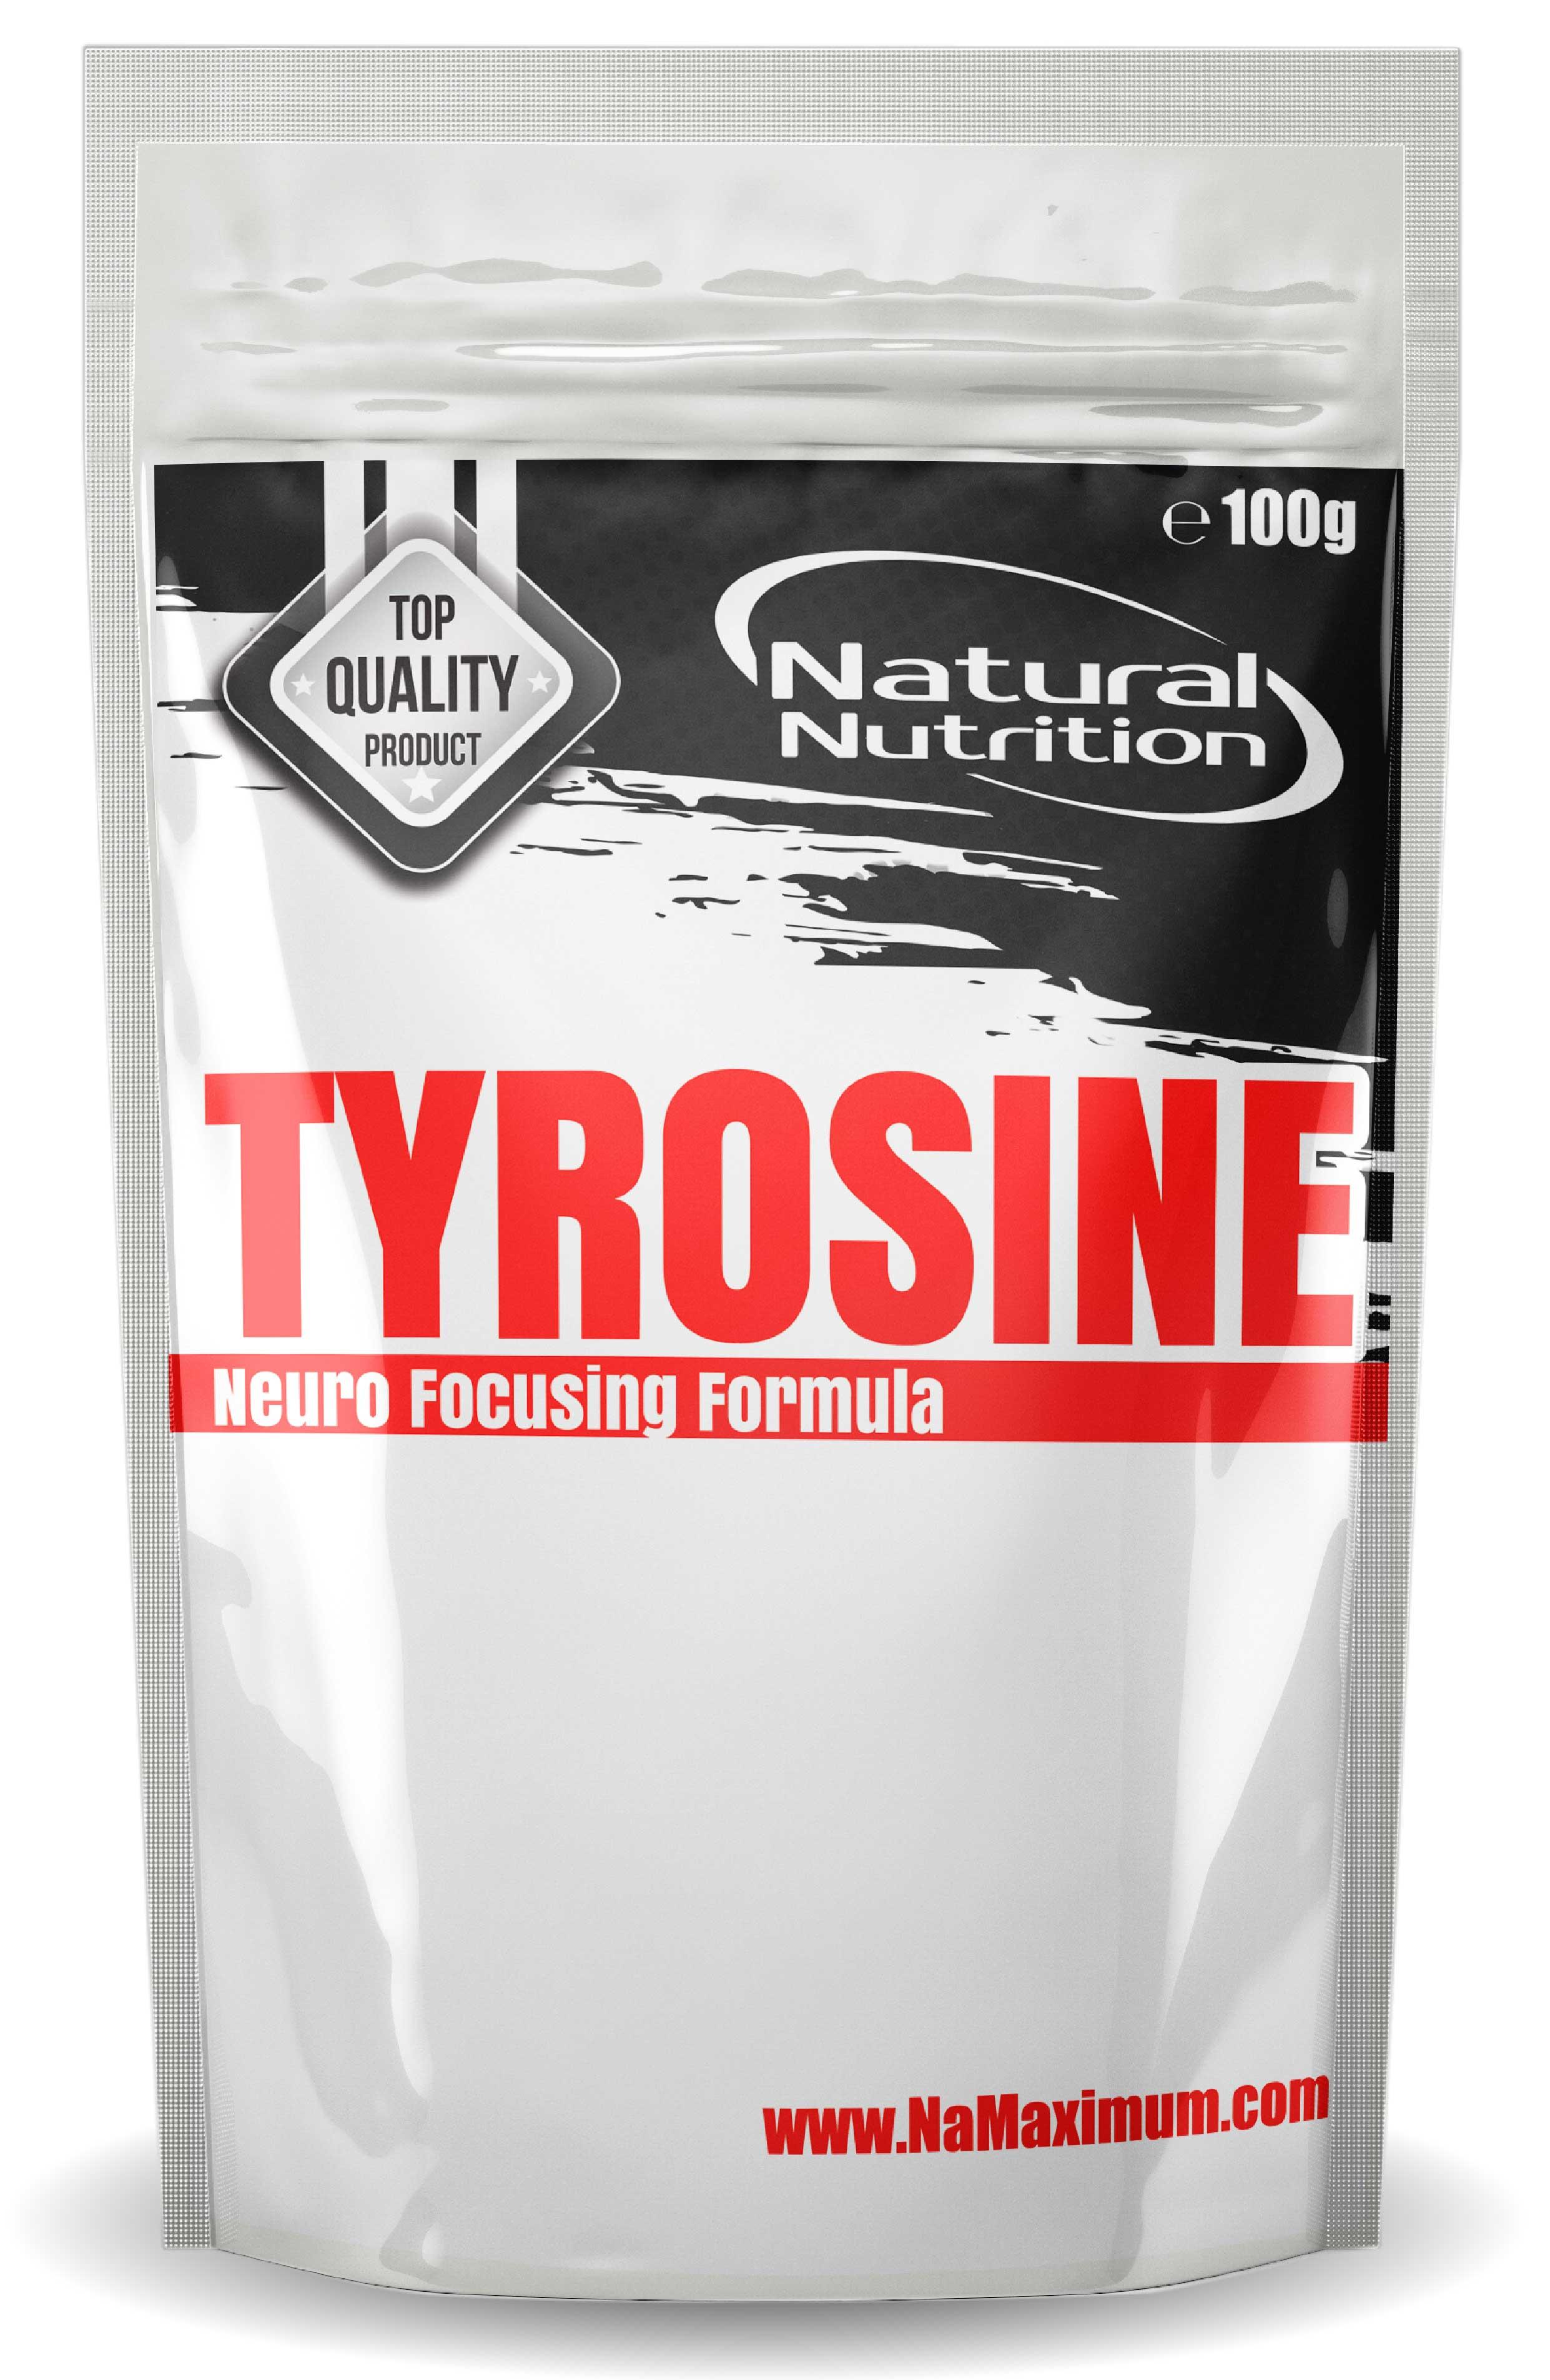 Tyrosine - L-Tyrosin Natural 100g